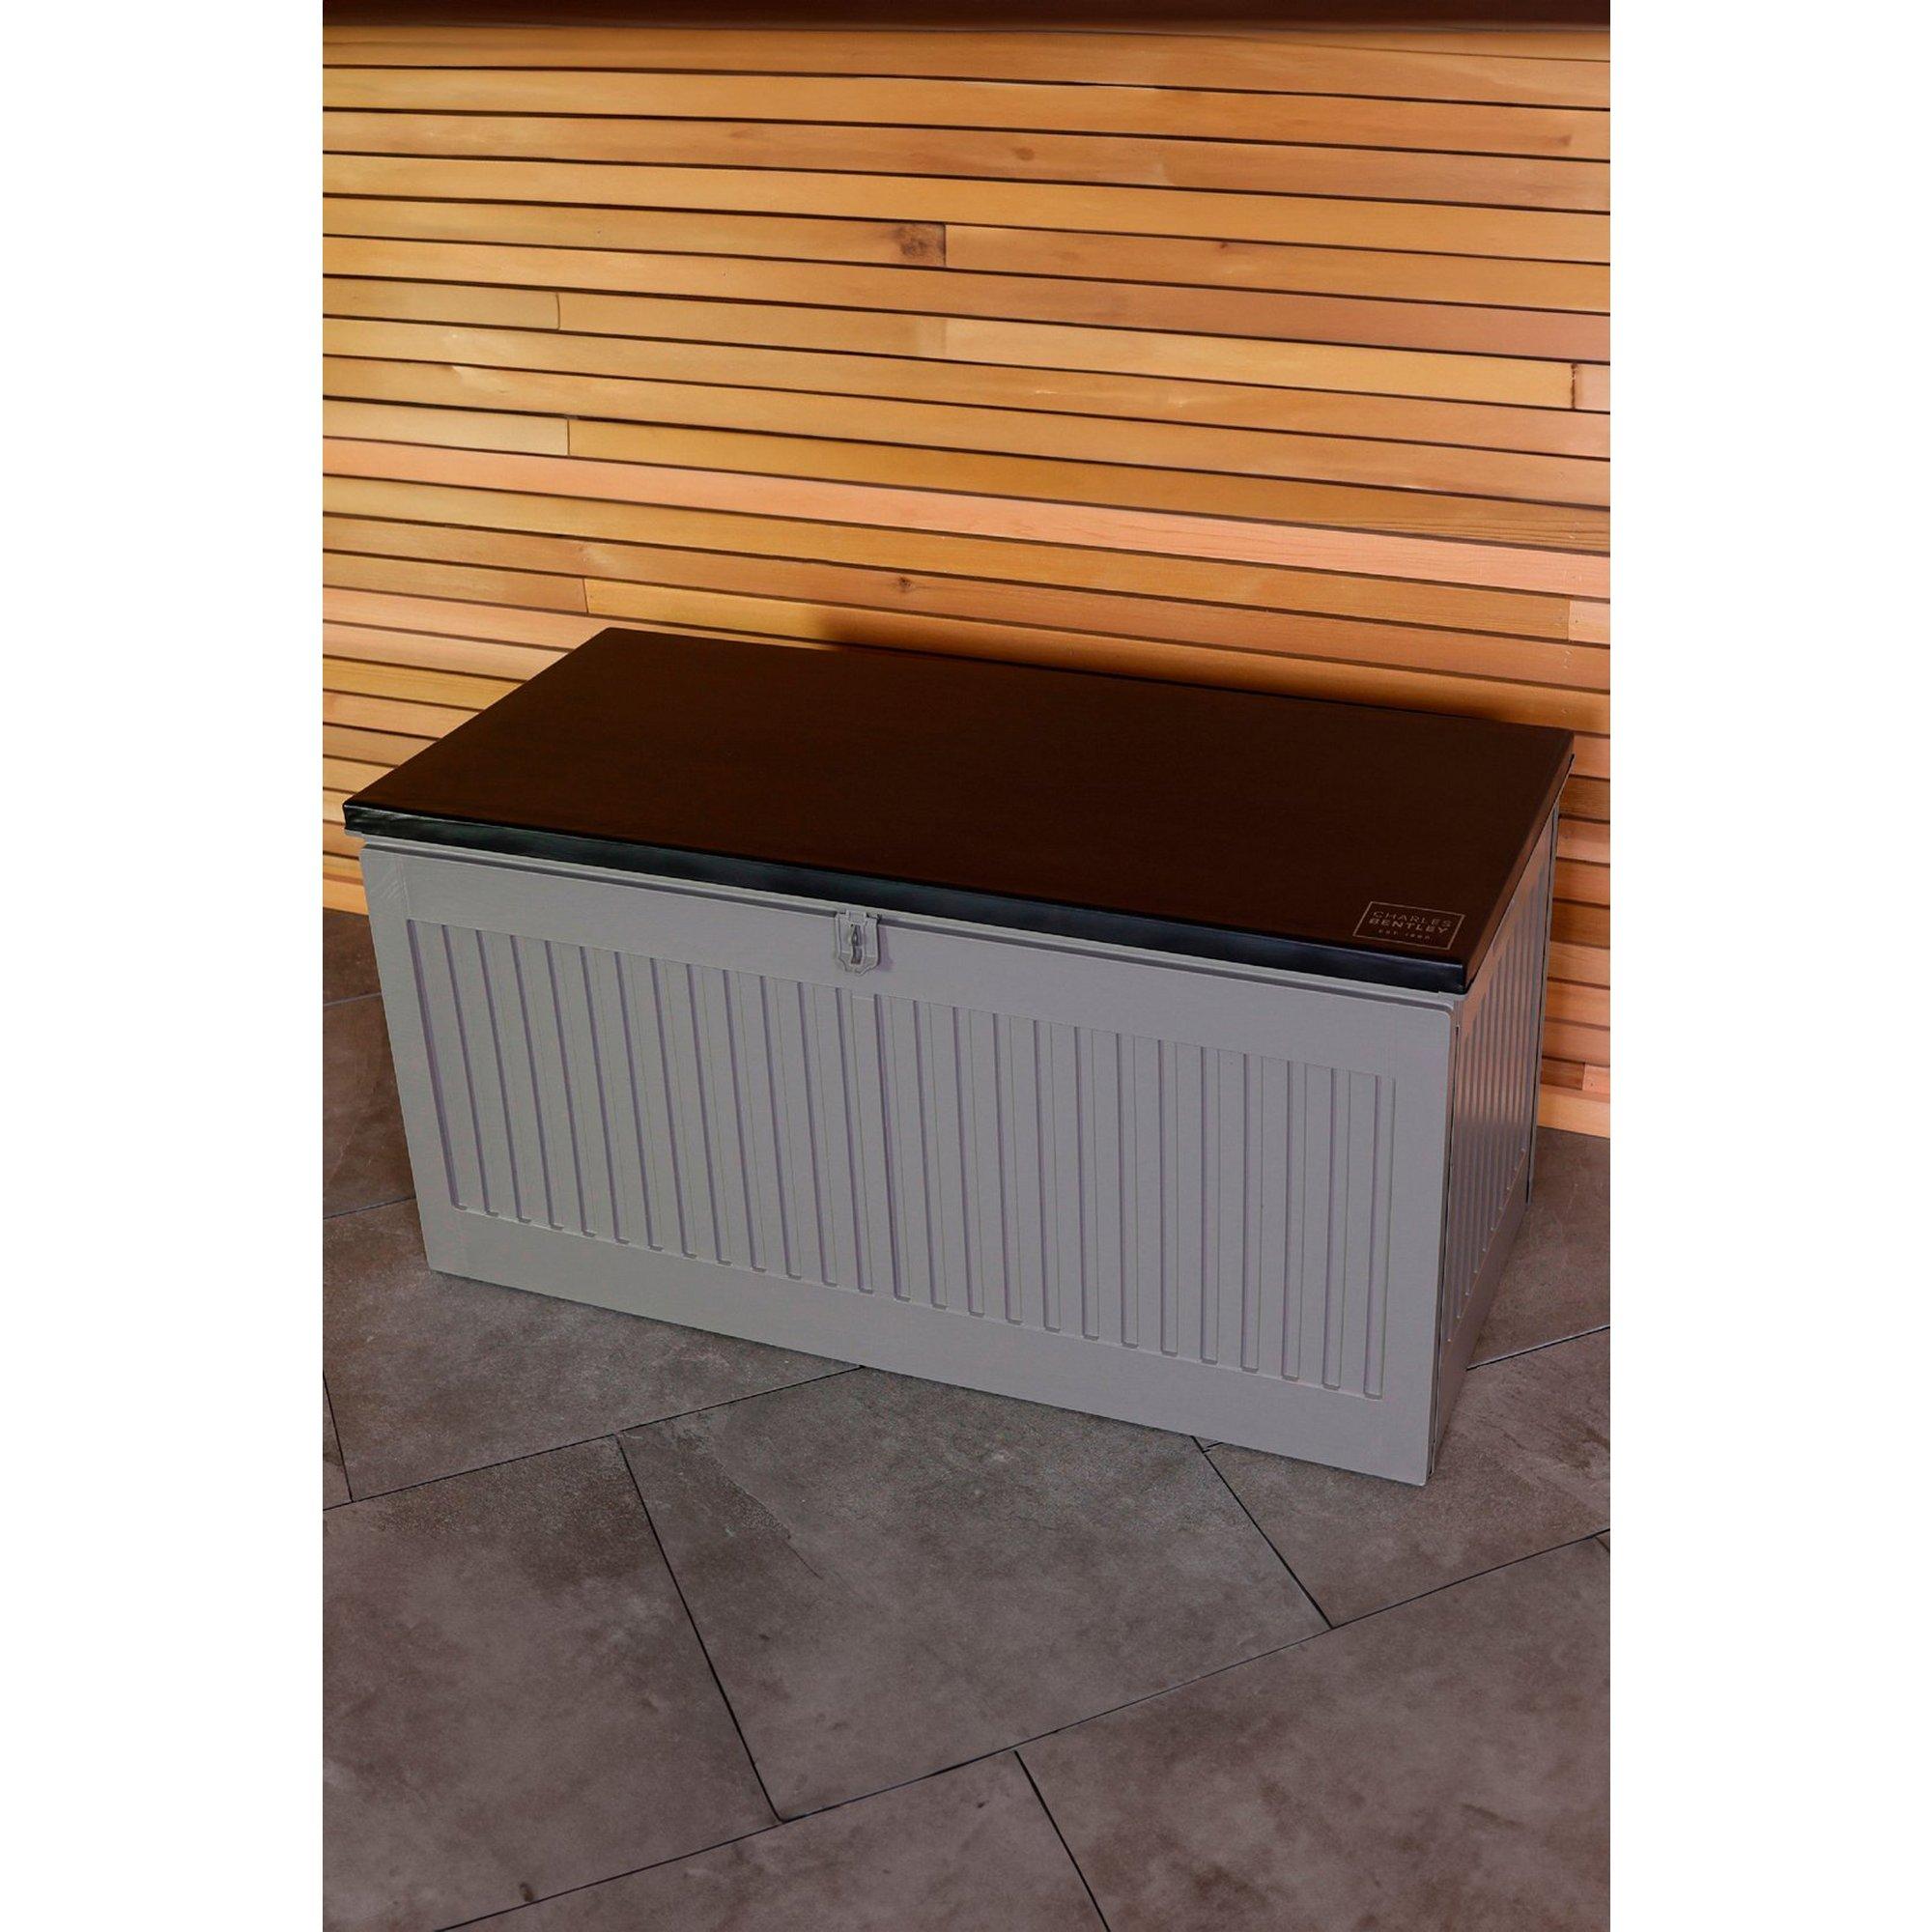 Image of 270L Plastic Outdoor Storage Box